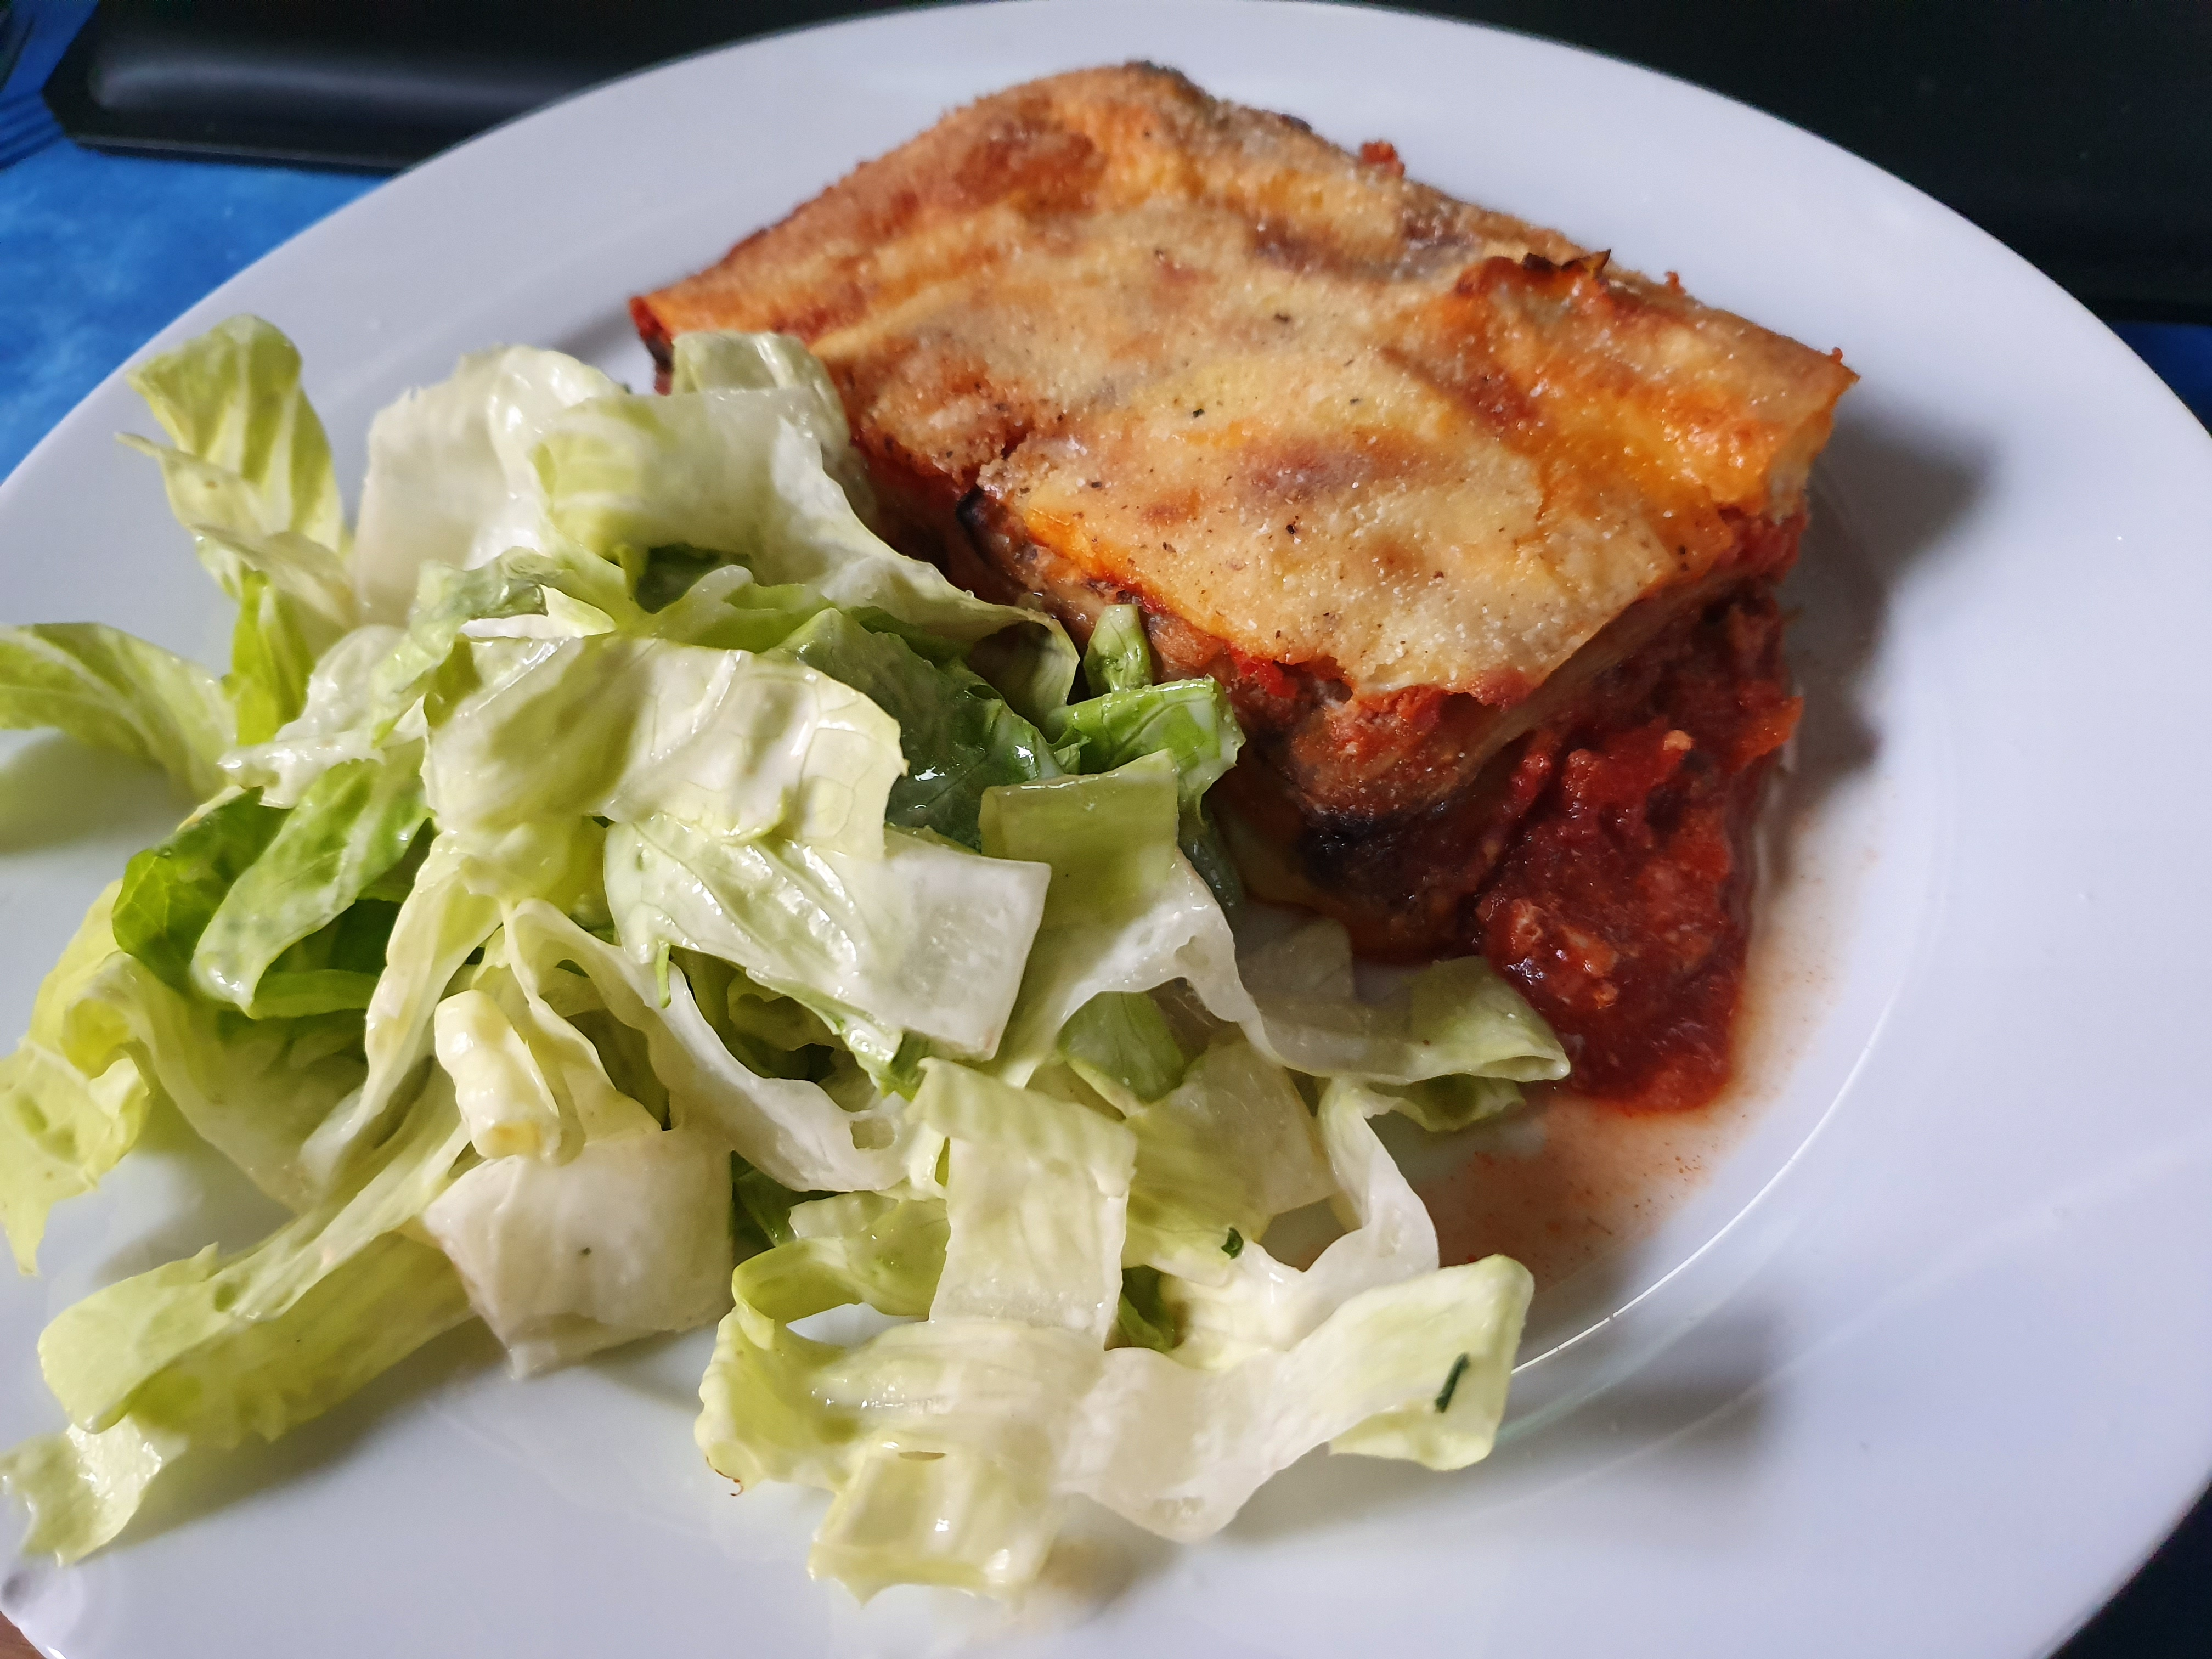 Melanzane alla Parmigiana (Baked Aubergine with Cheese & Tomato)